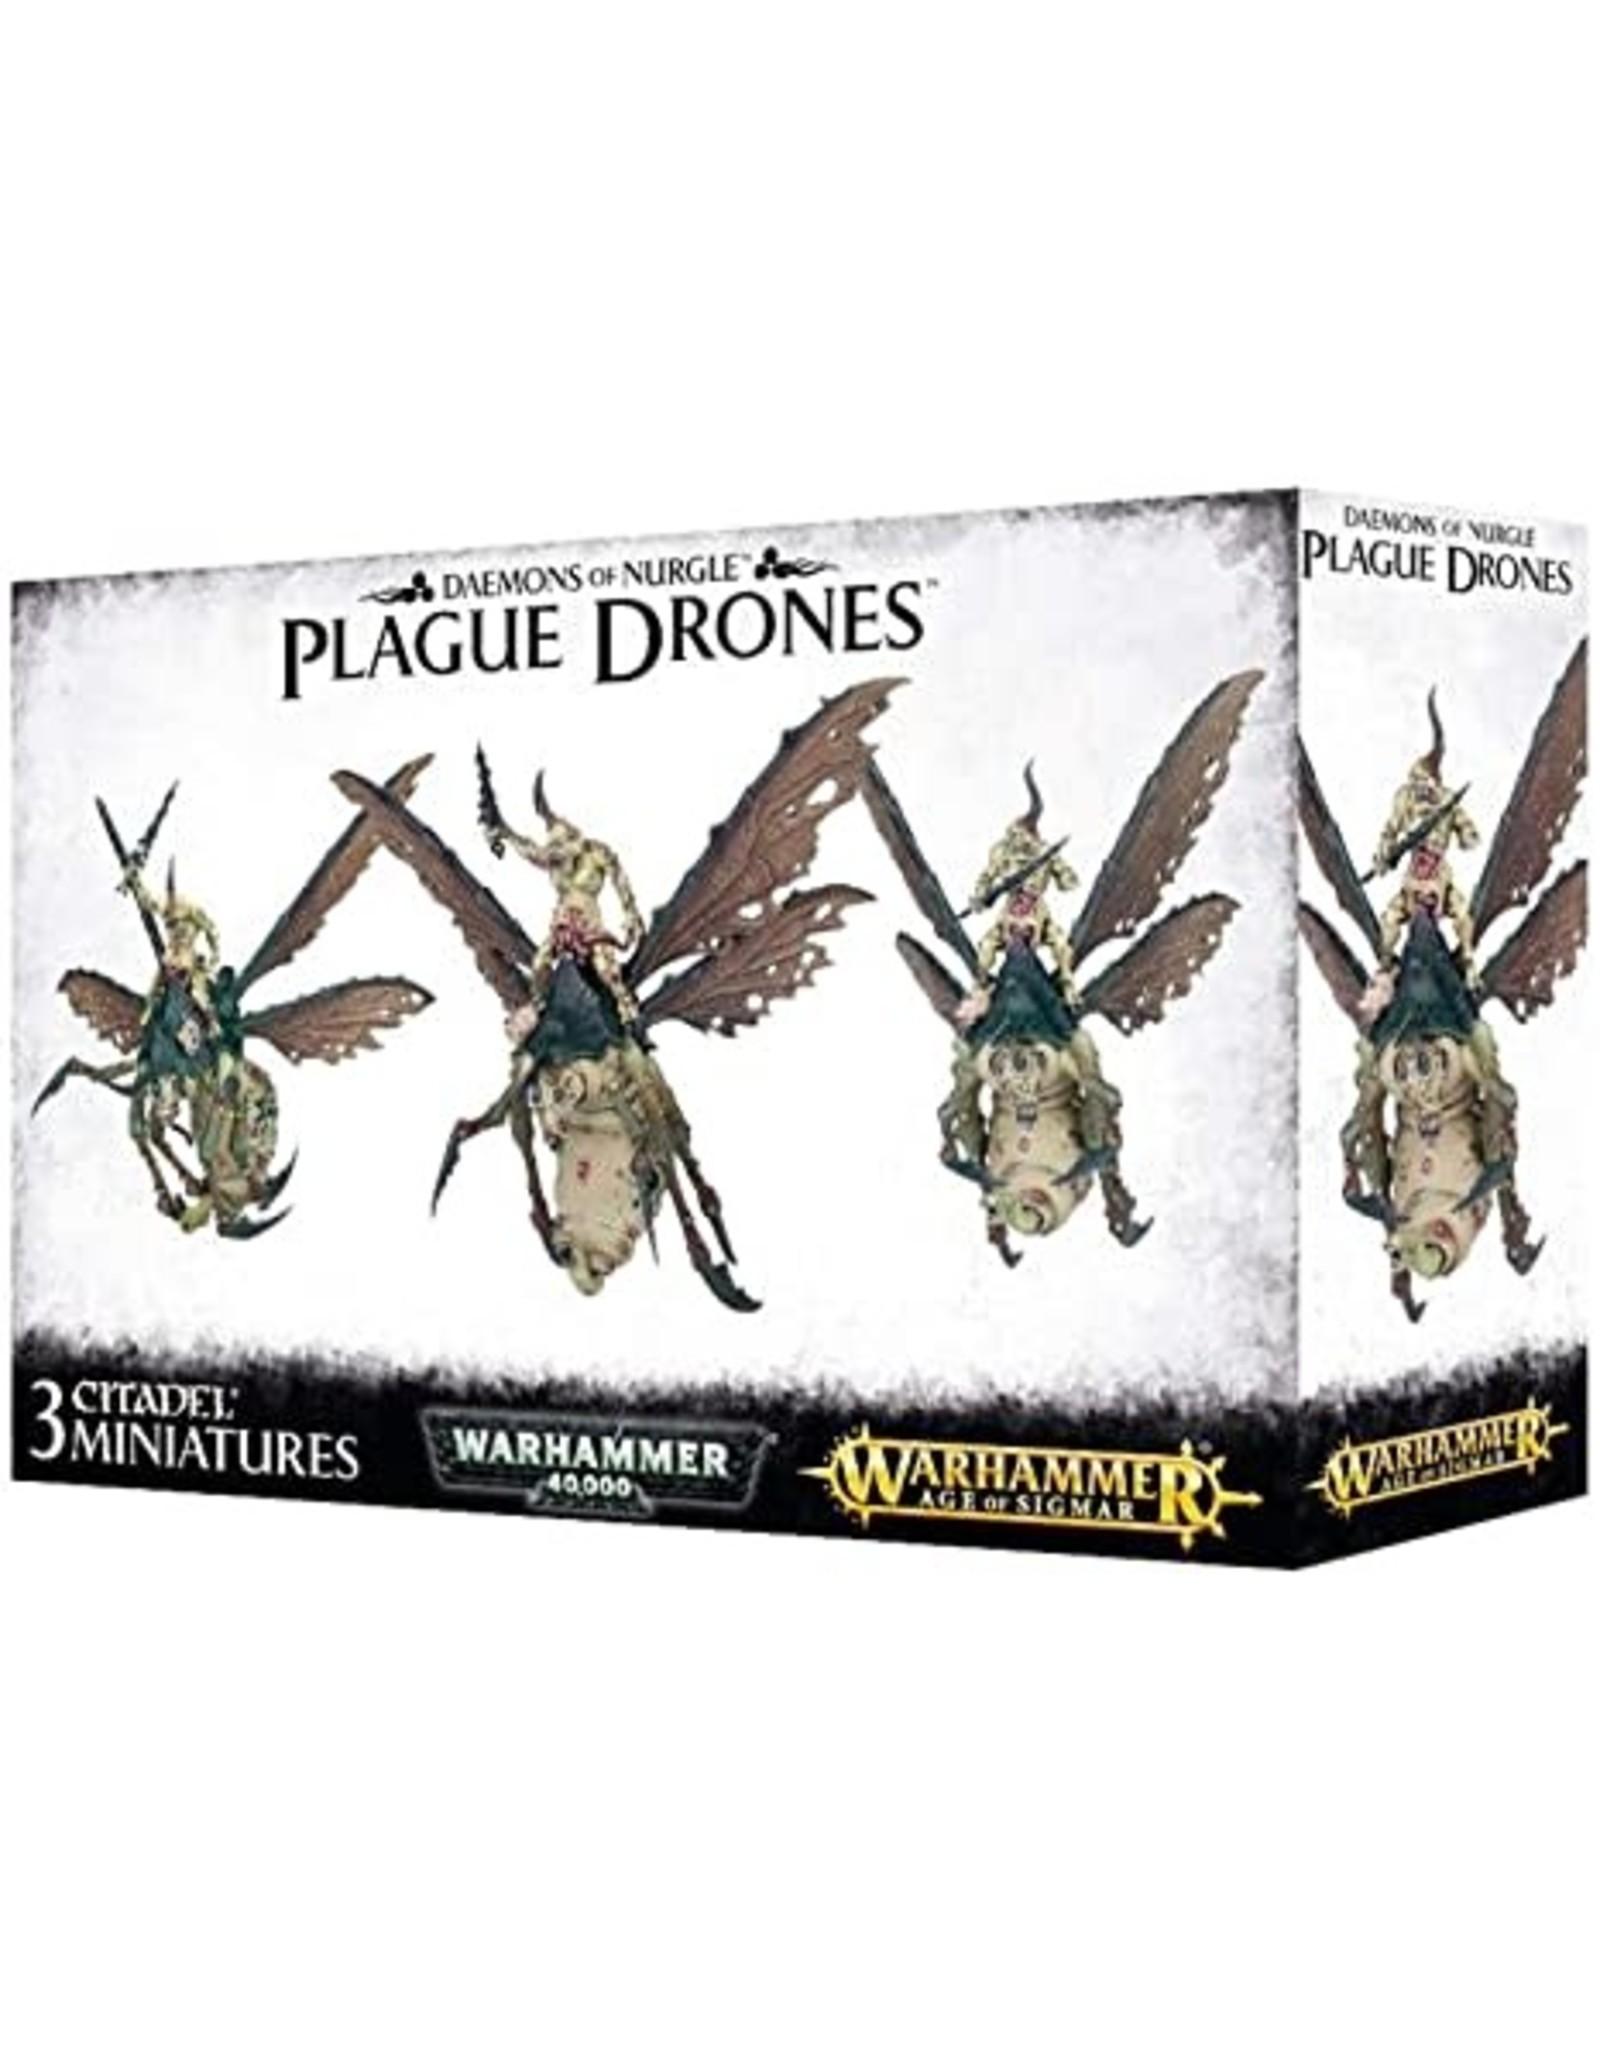 Age of Sigmar DAEMONS OF NURGLE PLAGUE DRONES